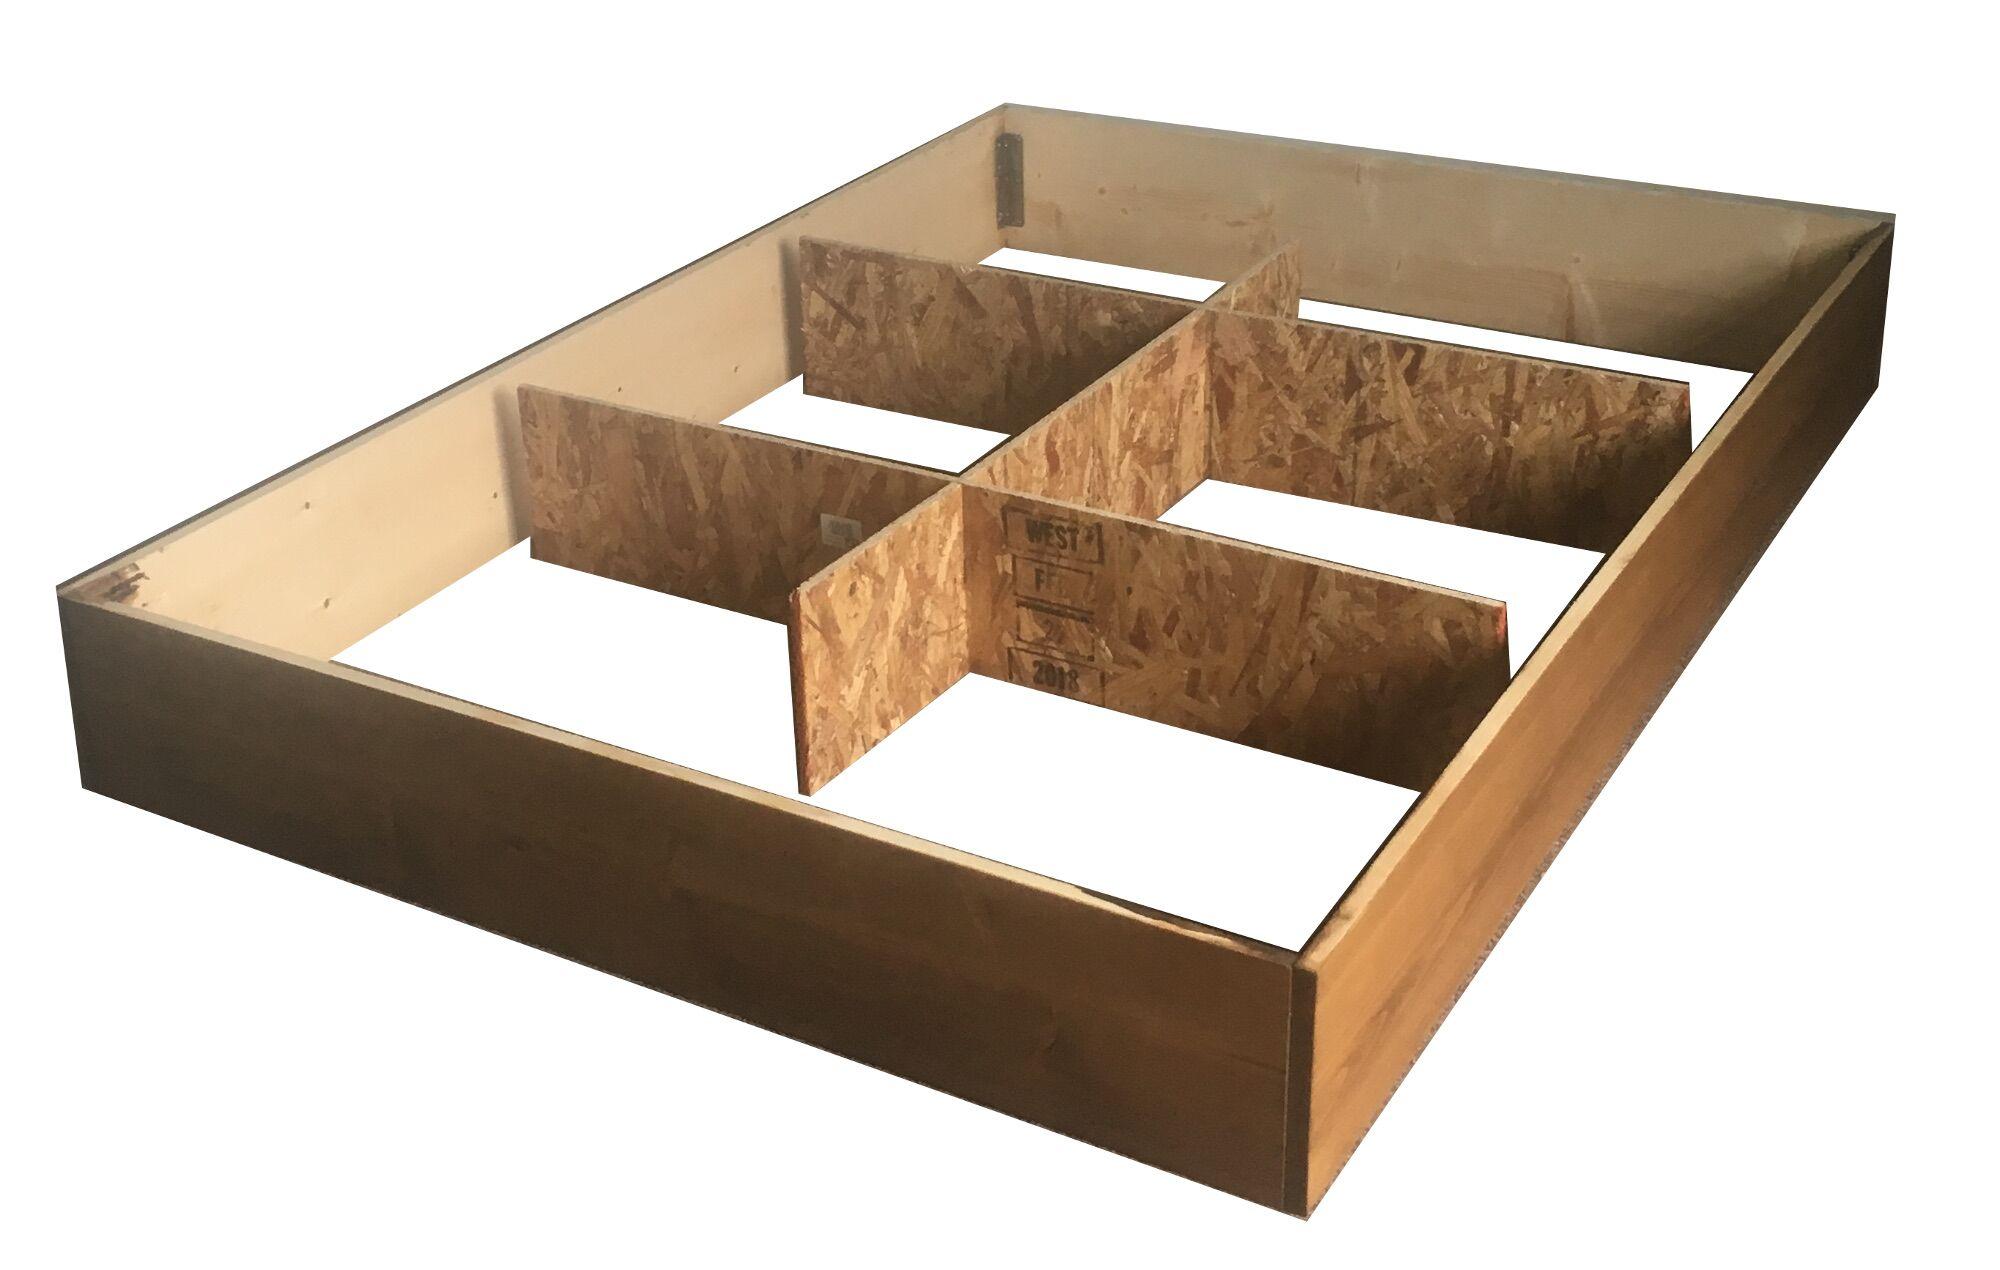 Allerton Waterbed Premium Solid Pine Pedestal Storage Platform Size: Queen, Color: Tan